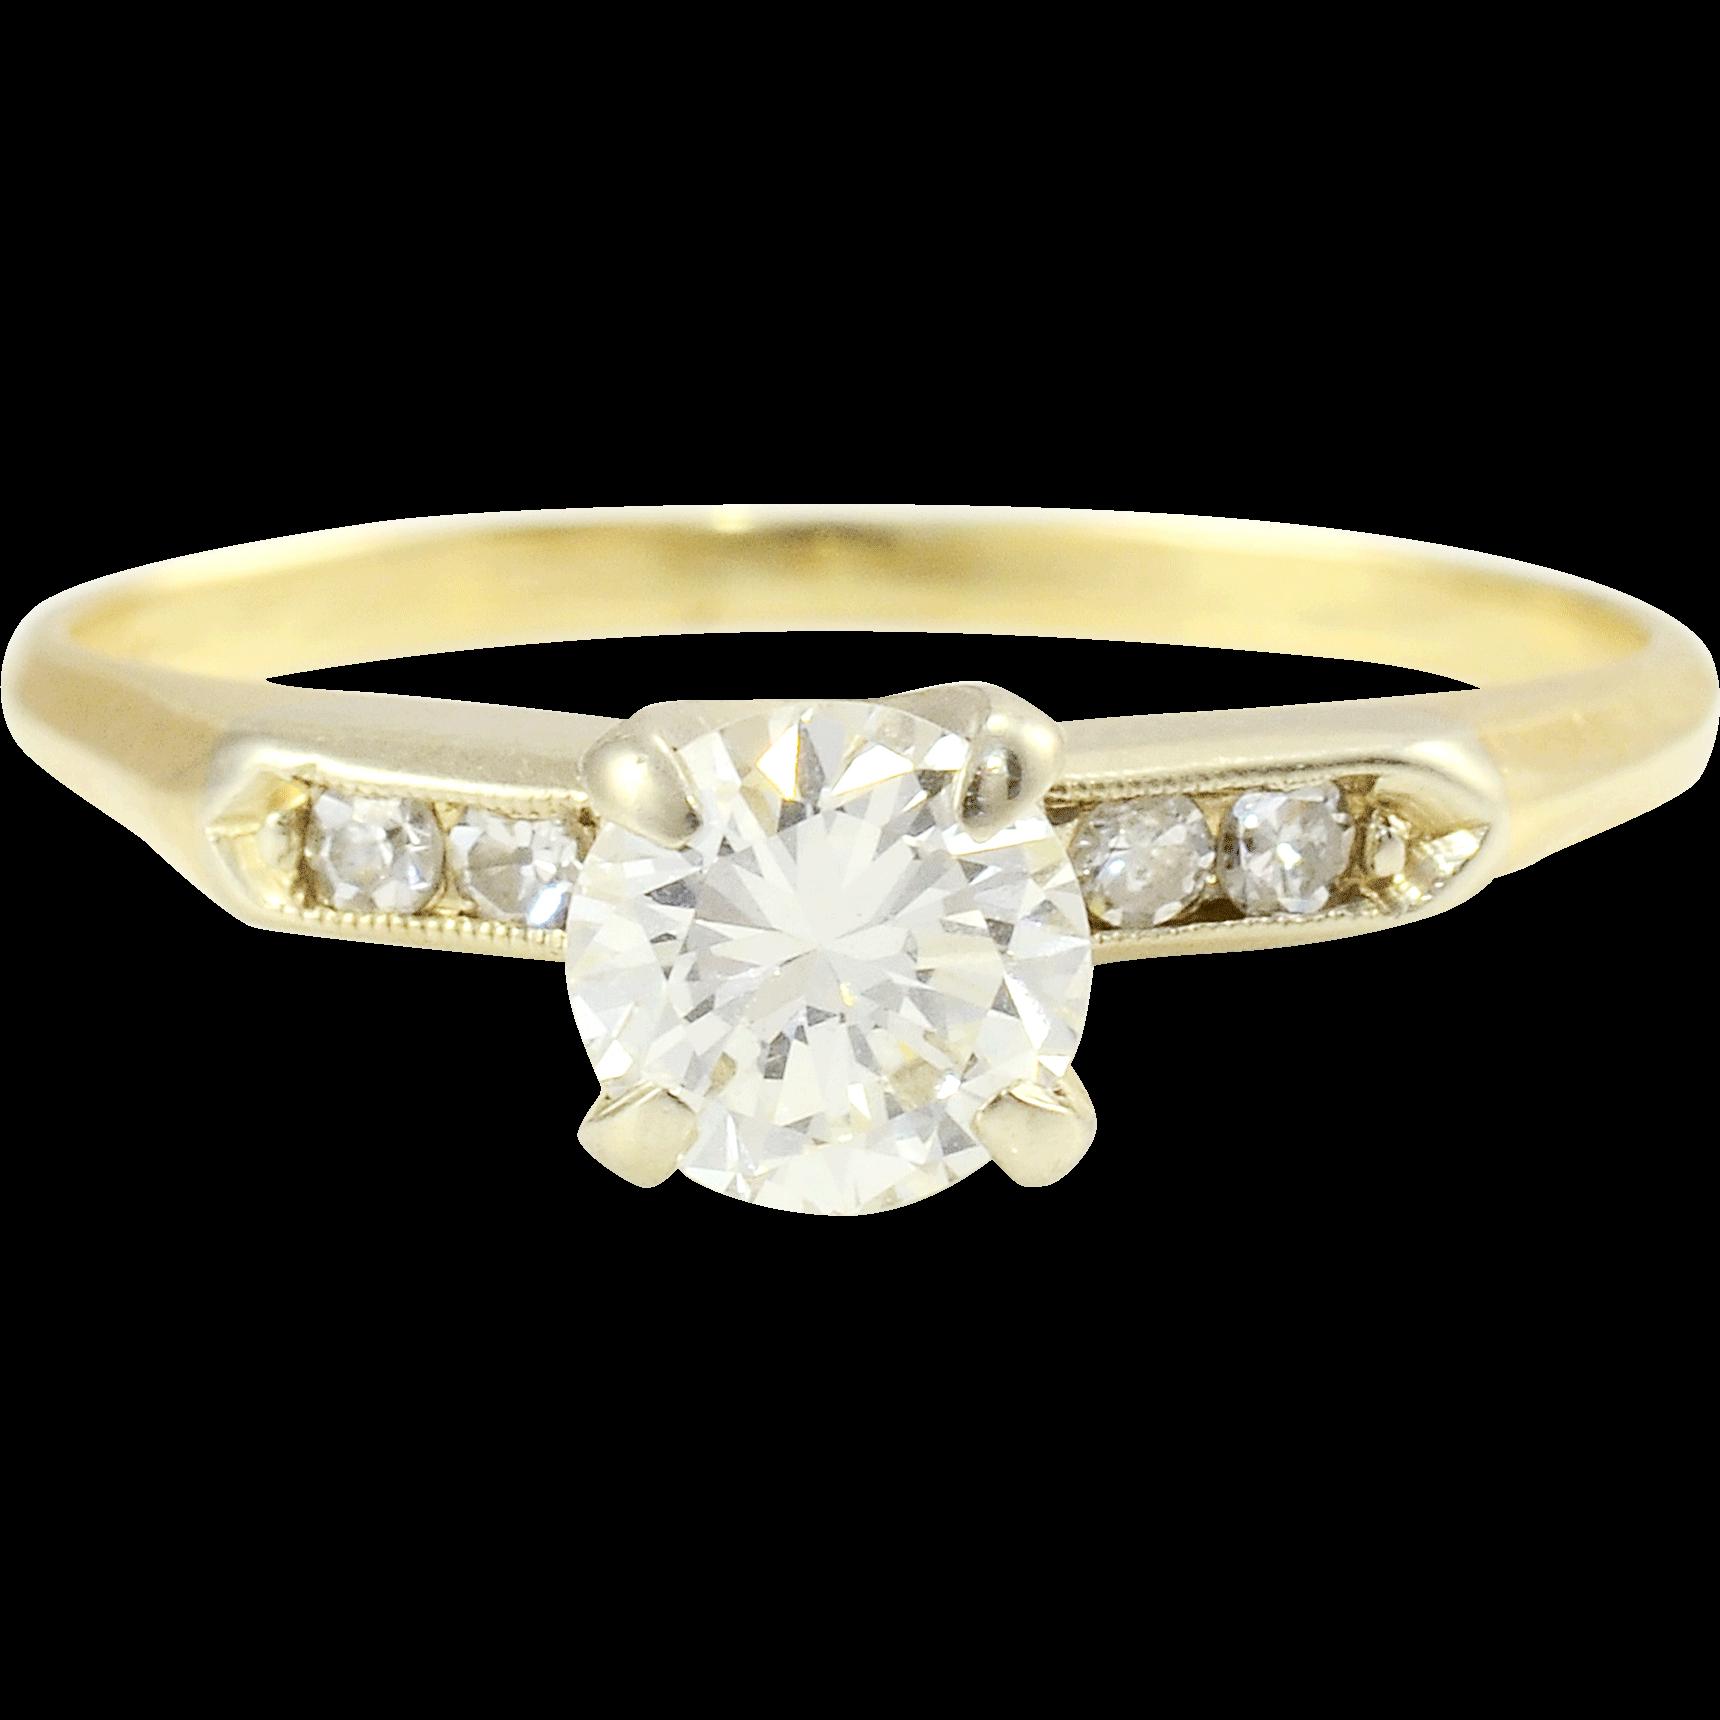 .75 Carat VS2 Diamond Center Engagement Ring